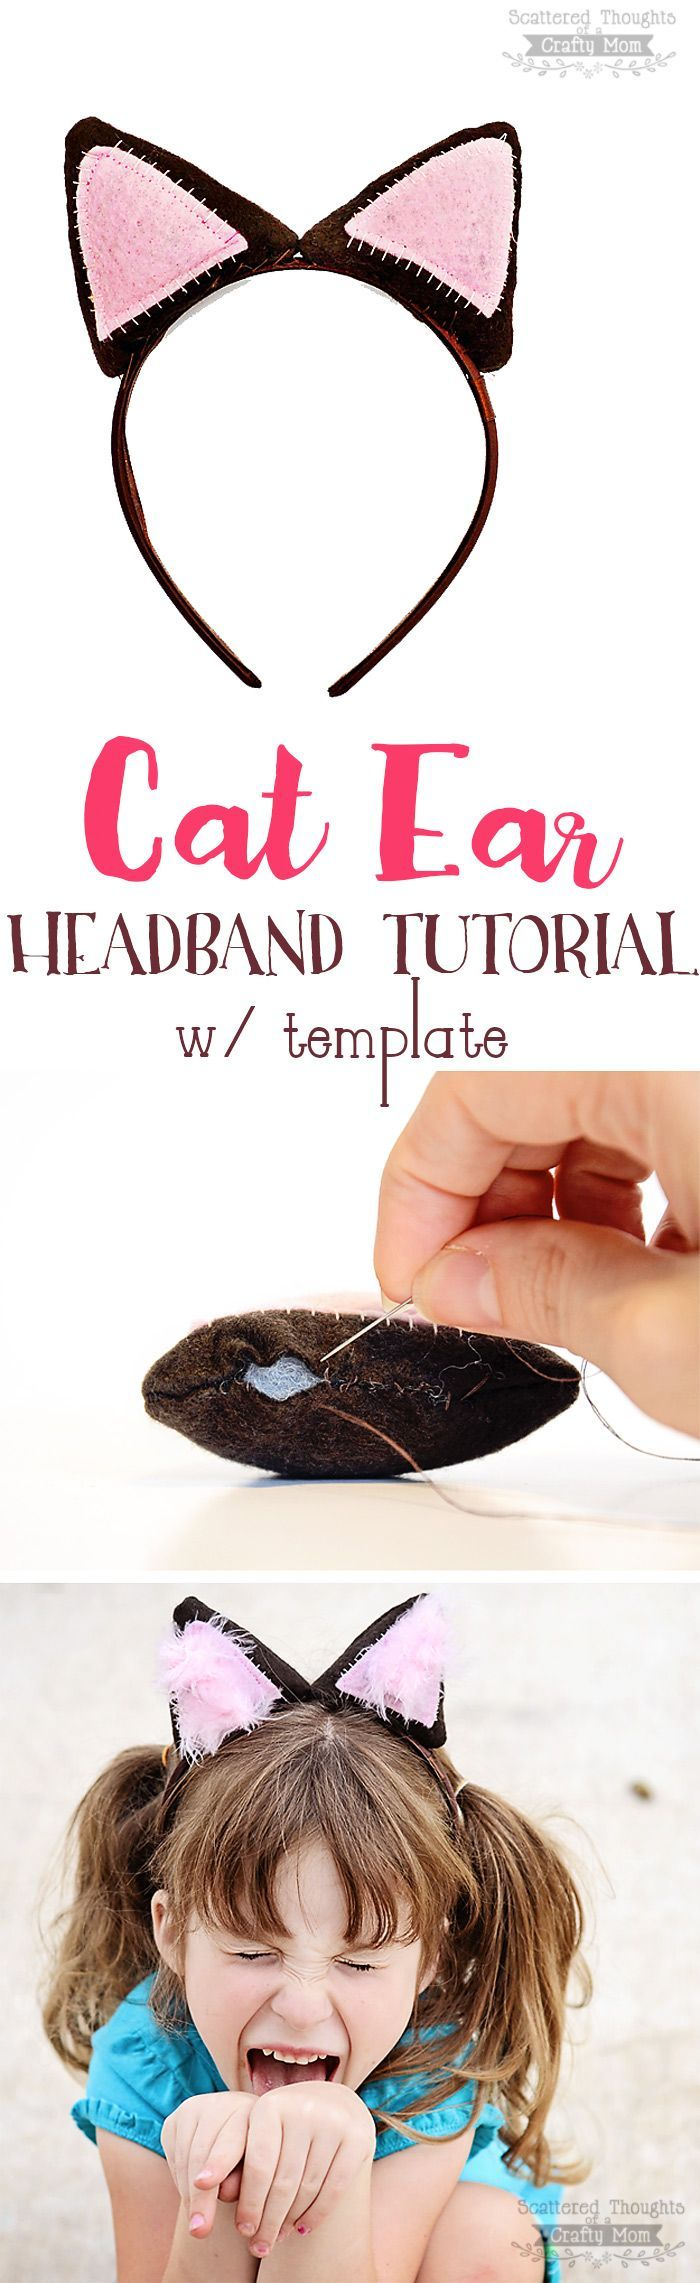 DIY Cat Ear Headband Tutorial w/ Template Dress up, Cats